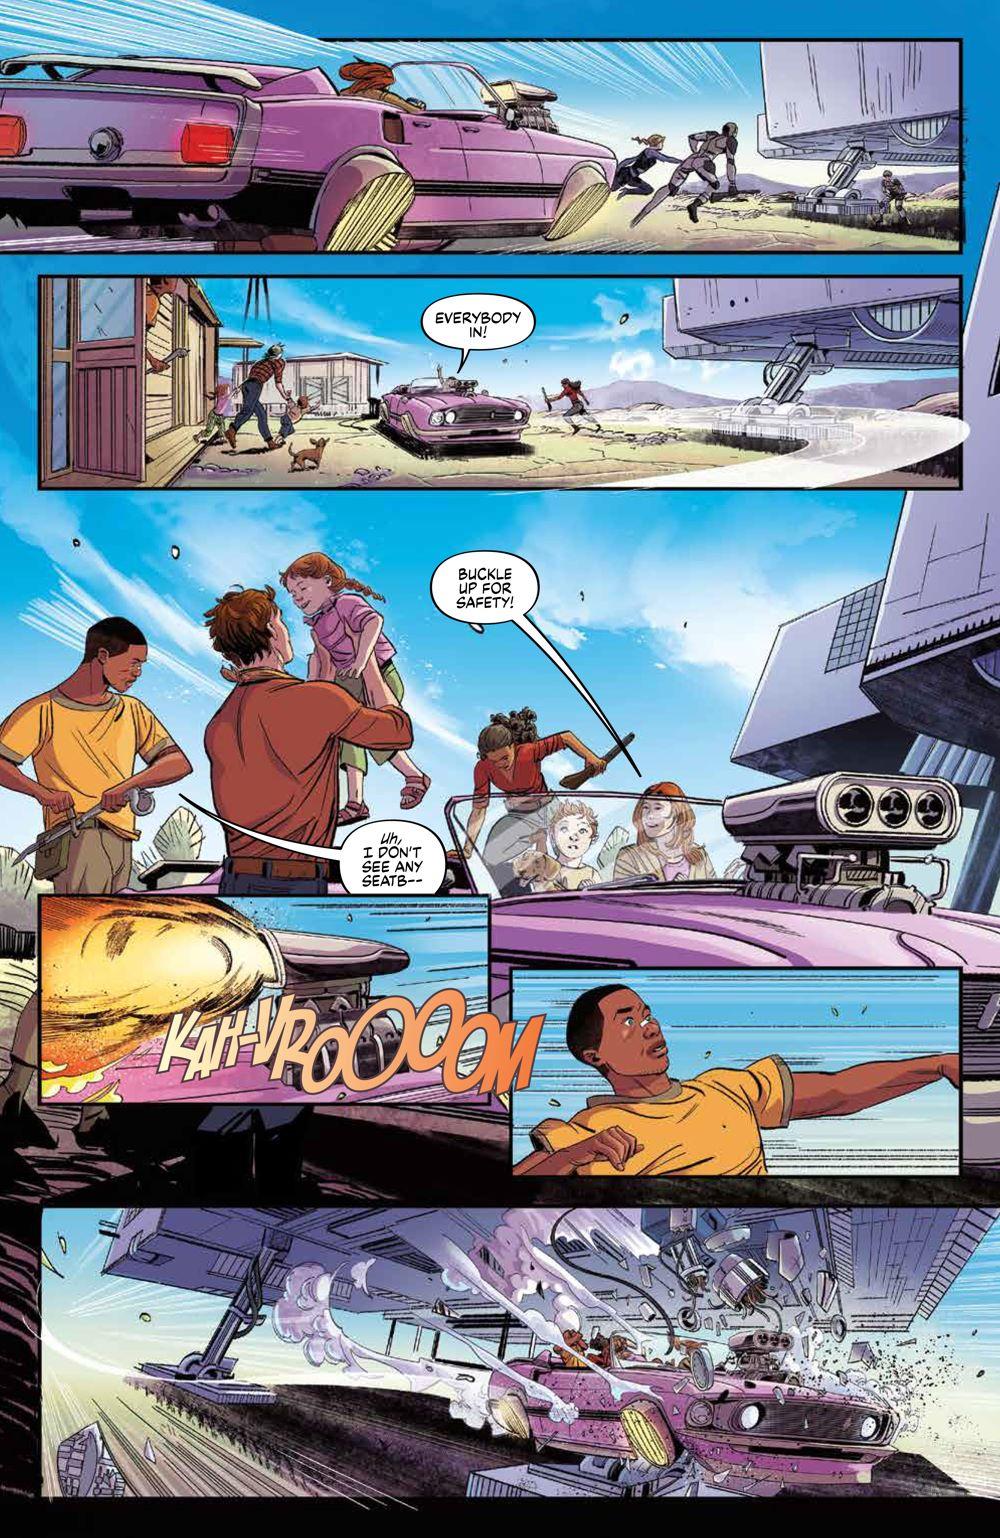 Firefly_BrandNewVerse_004_PRESS_7 ComicList Previews: FIREFLY A BRAND NEW 'VERSE #4 (OF 6)